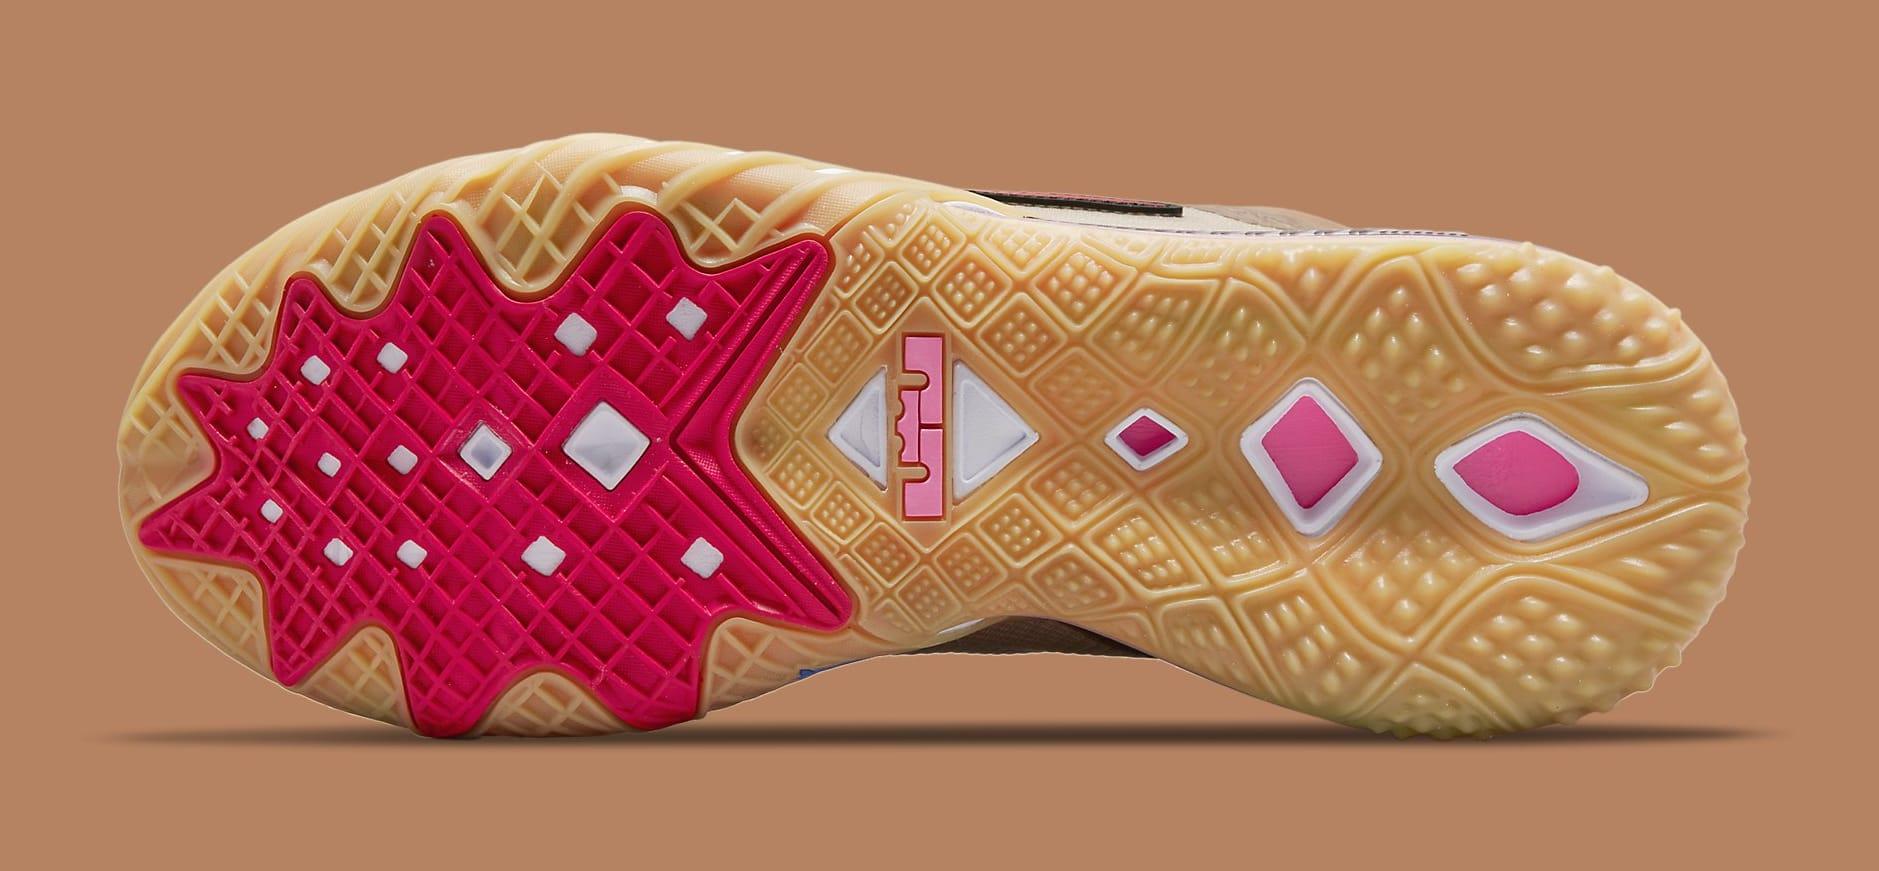 Xbox x Nike LeBron 18 Low 'Wile E. x Roadrunner' DO7172-900 Outsole